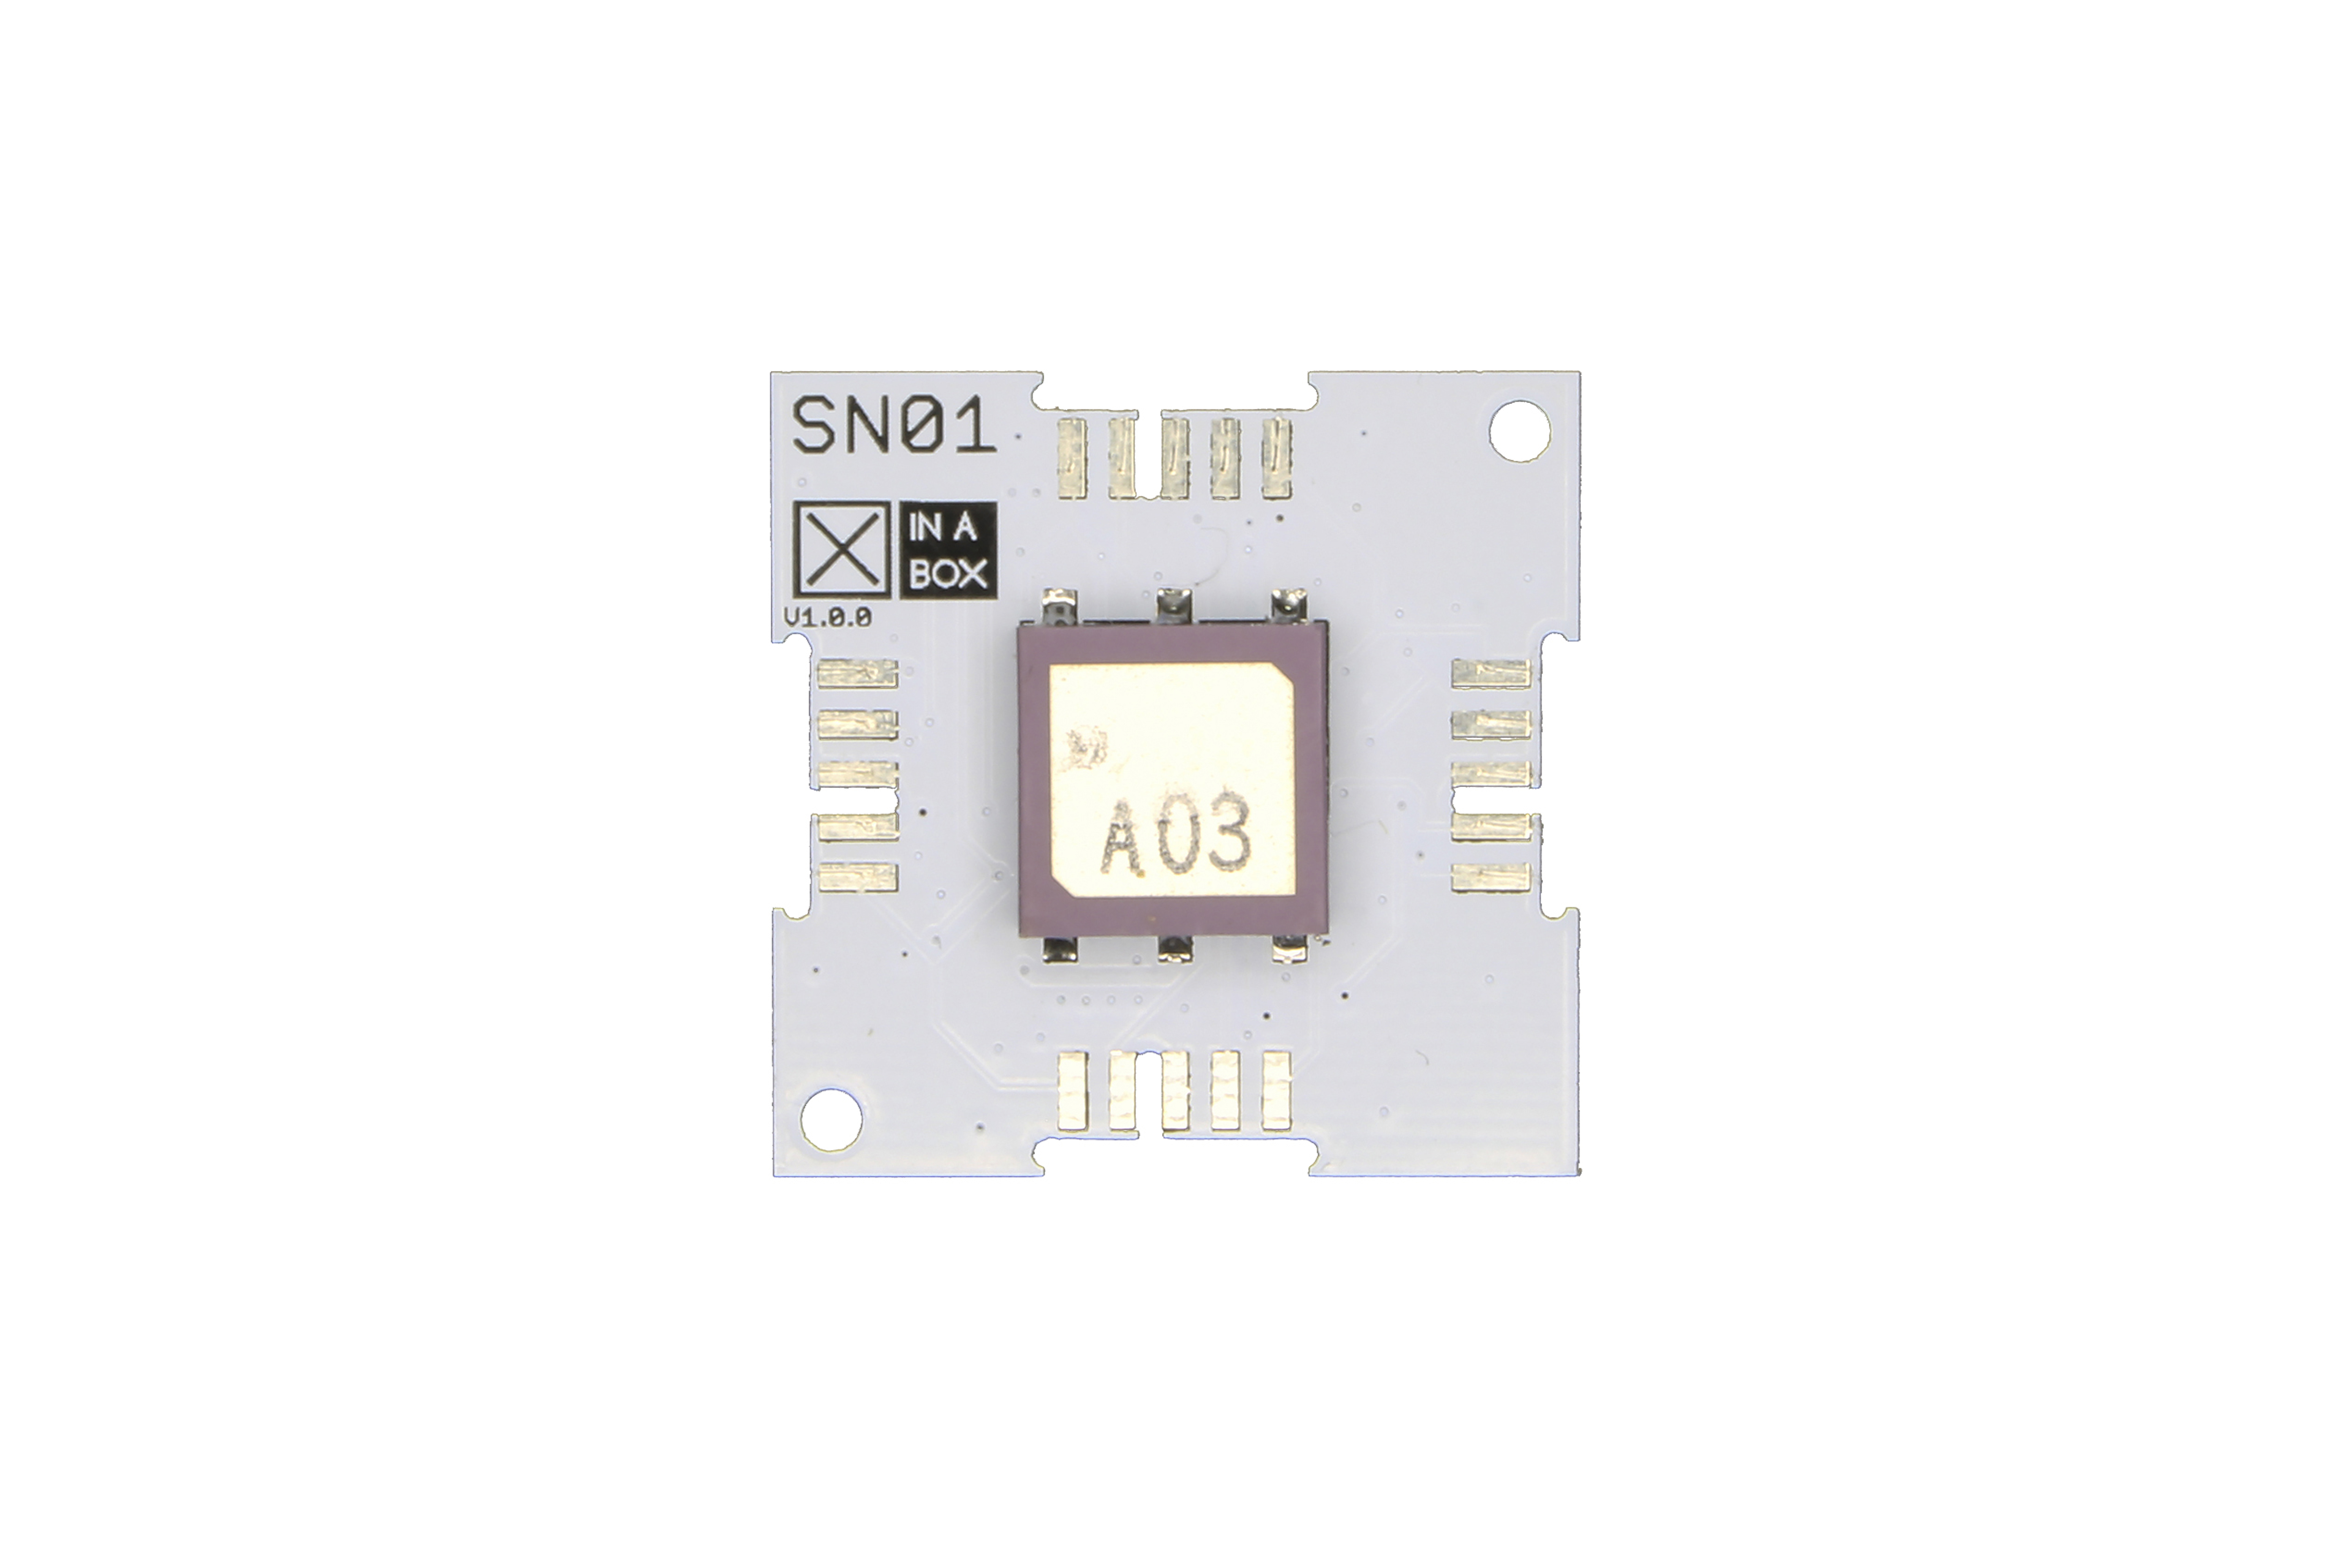 Modulo XinaBox GNSS (GPS) per NEO-6M